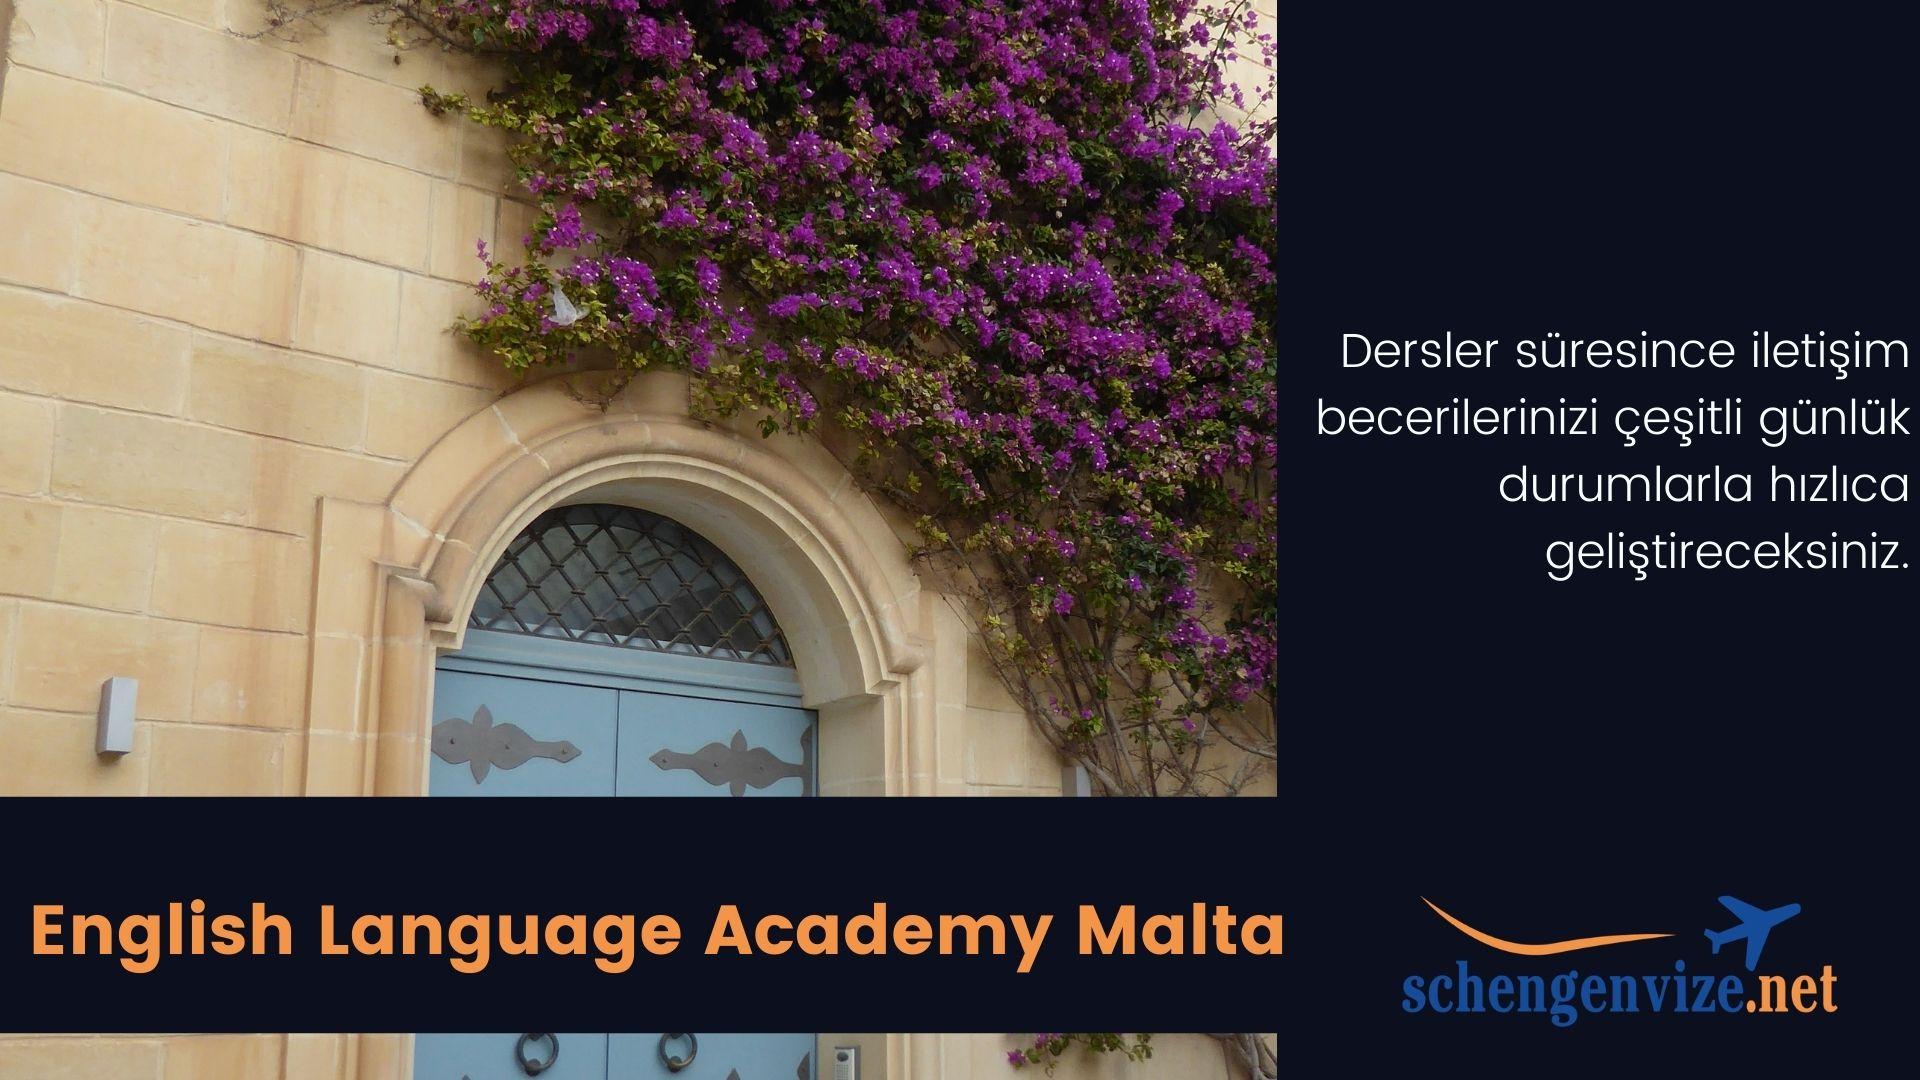 English Language Academy Malta